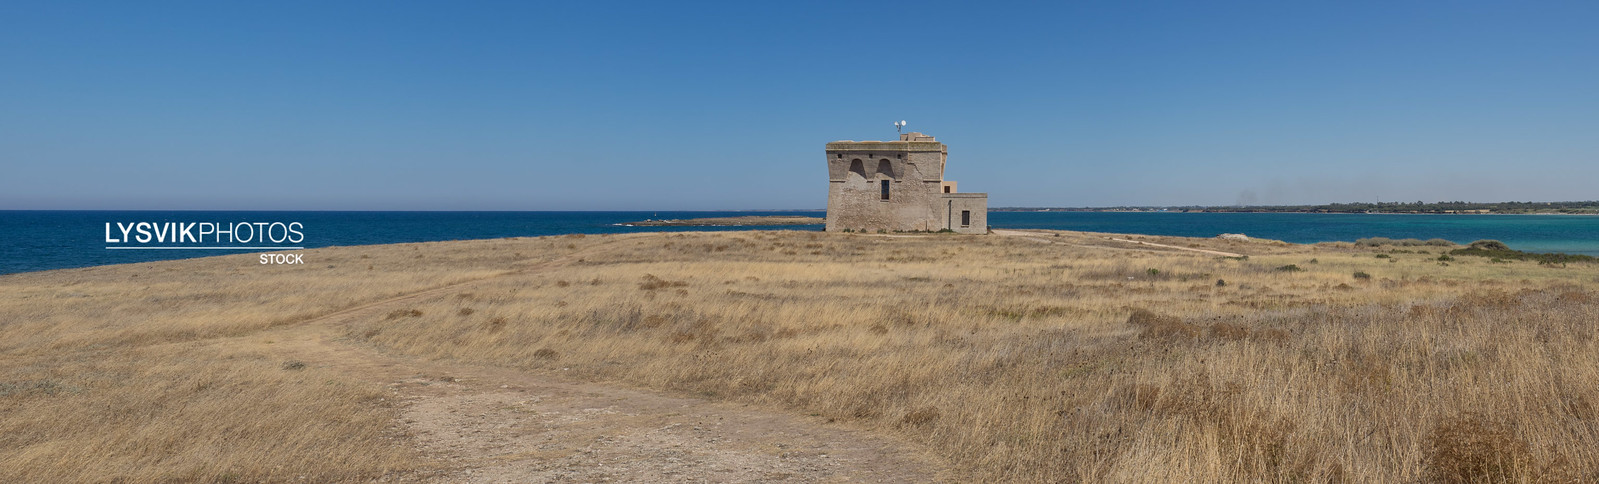 Watch tower Torre Guaceto, Puglia Panorama XXL